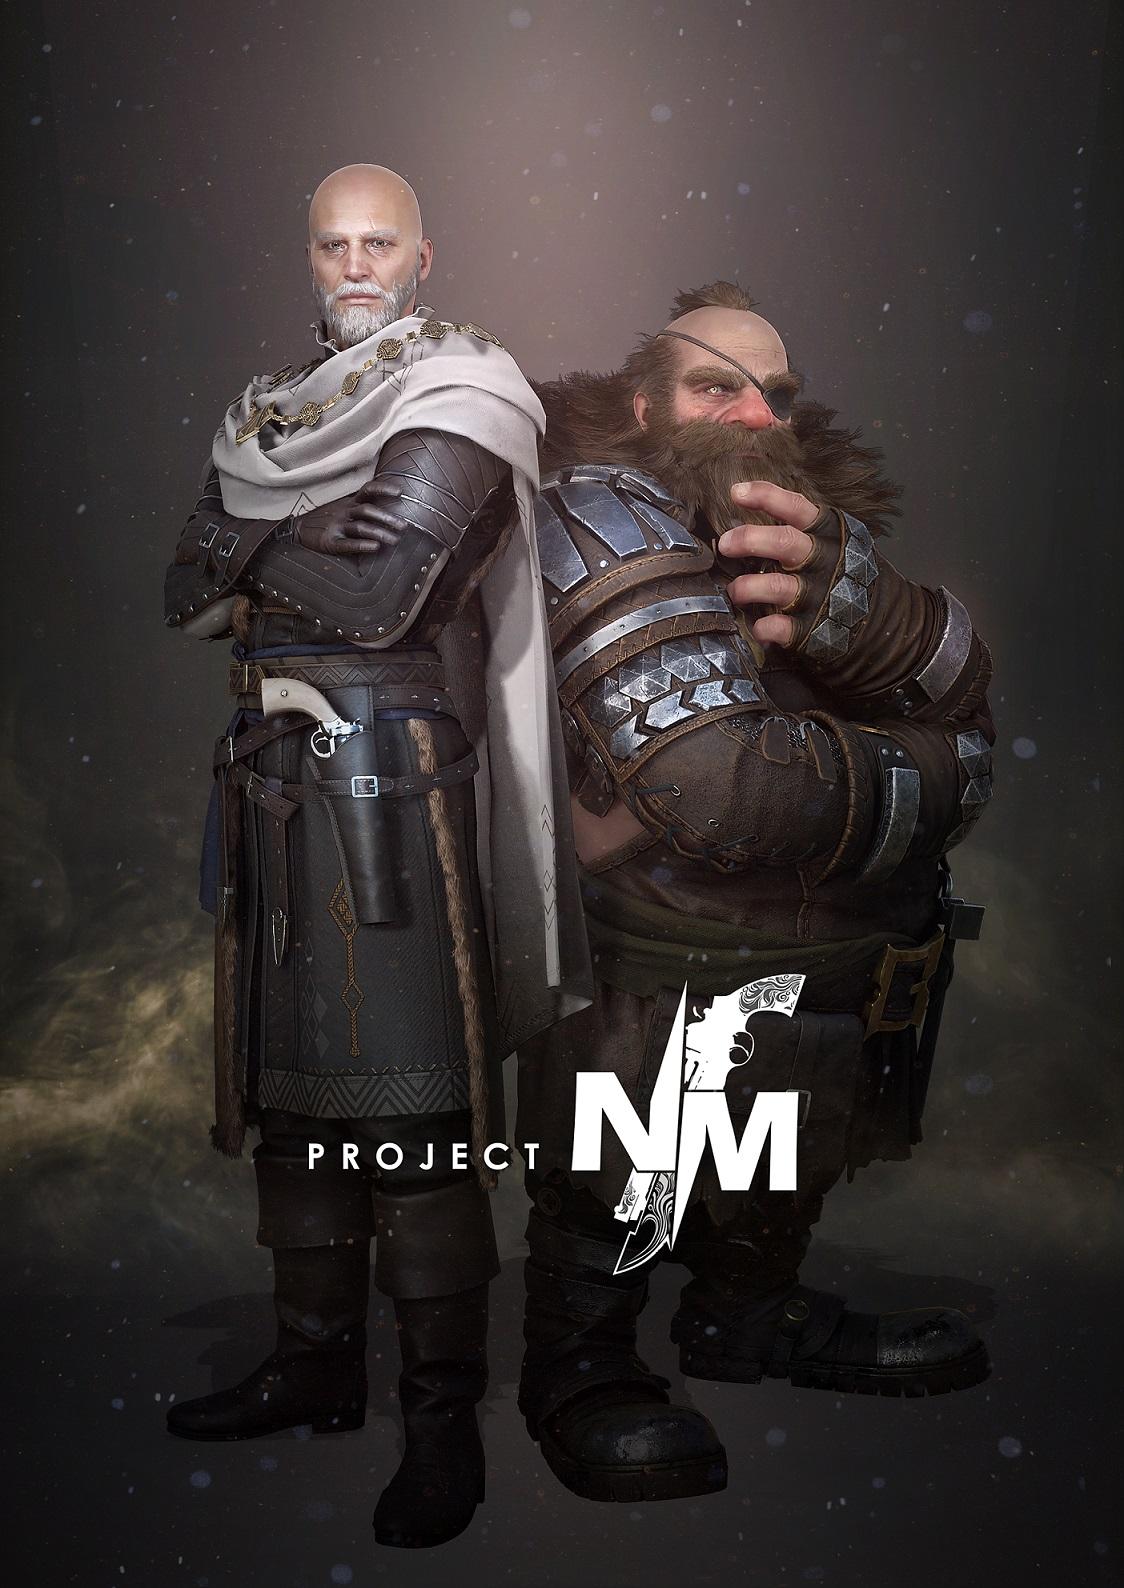 ProjectN